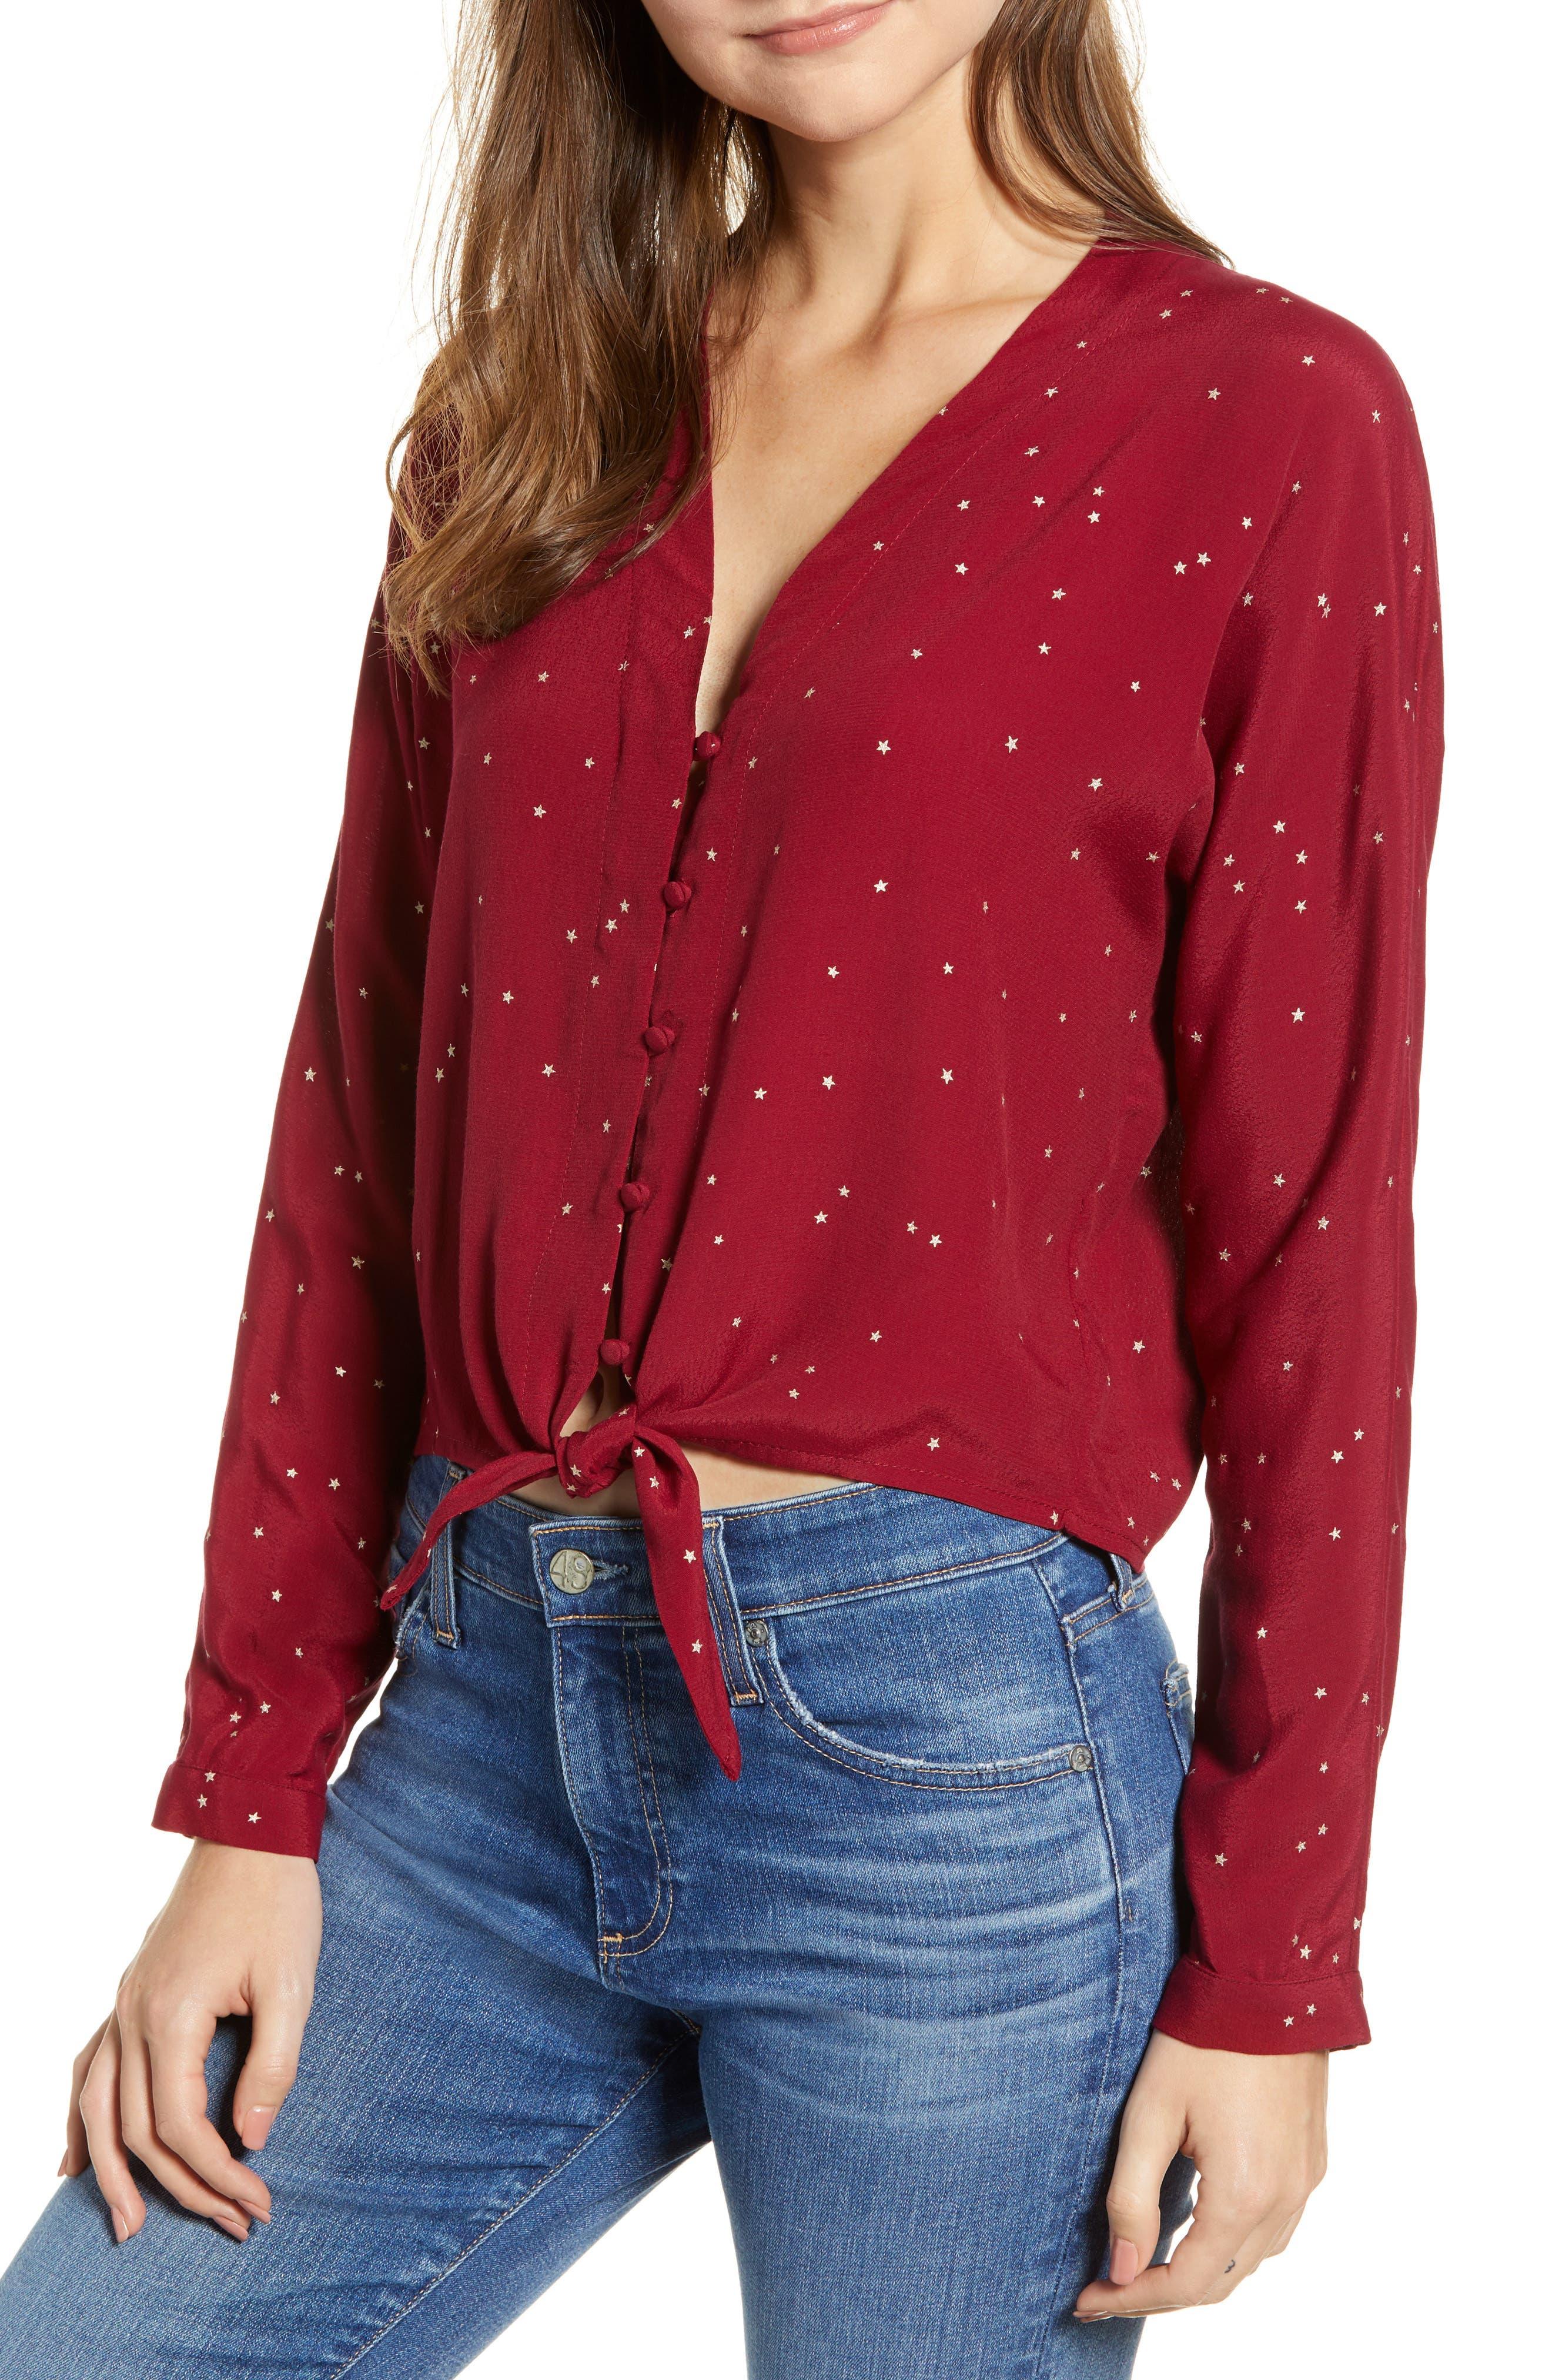 Sloane Blouse,                         Main,                         color, ROUGE GRADIENT STARS